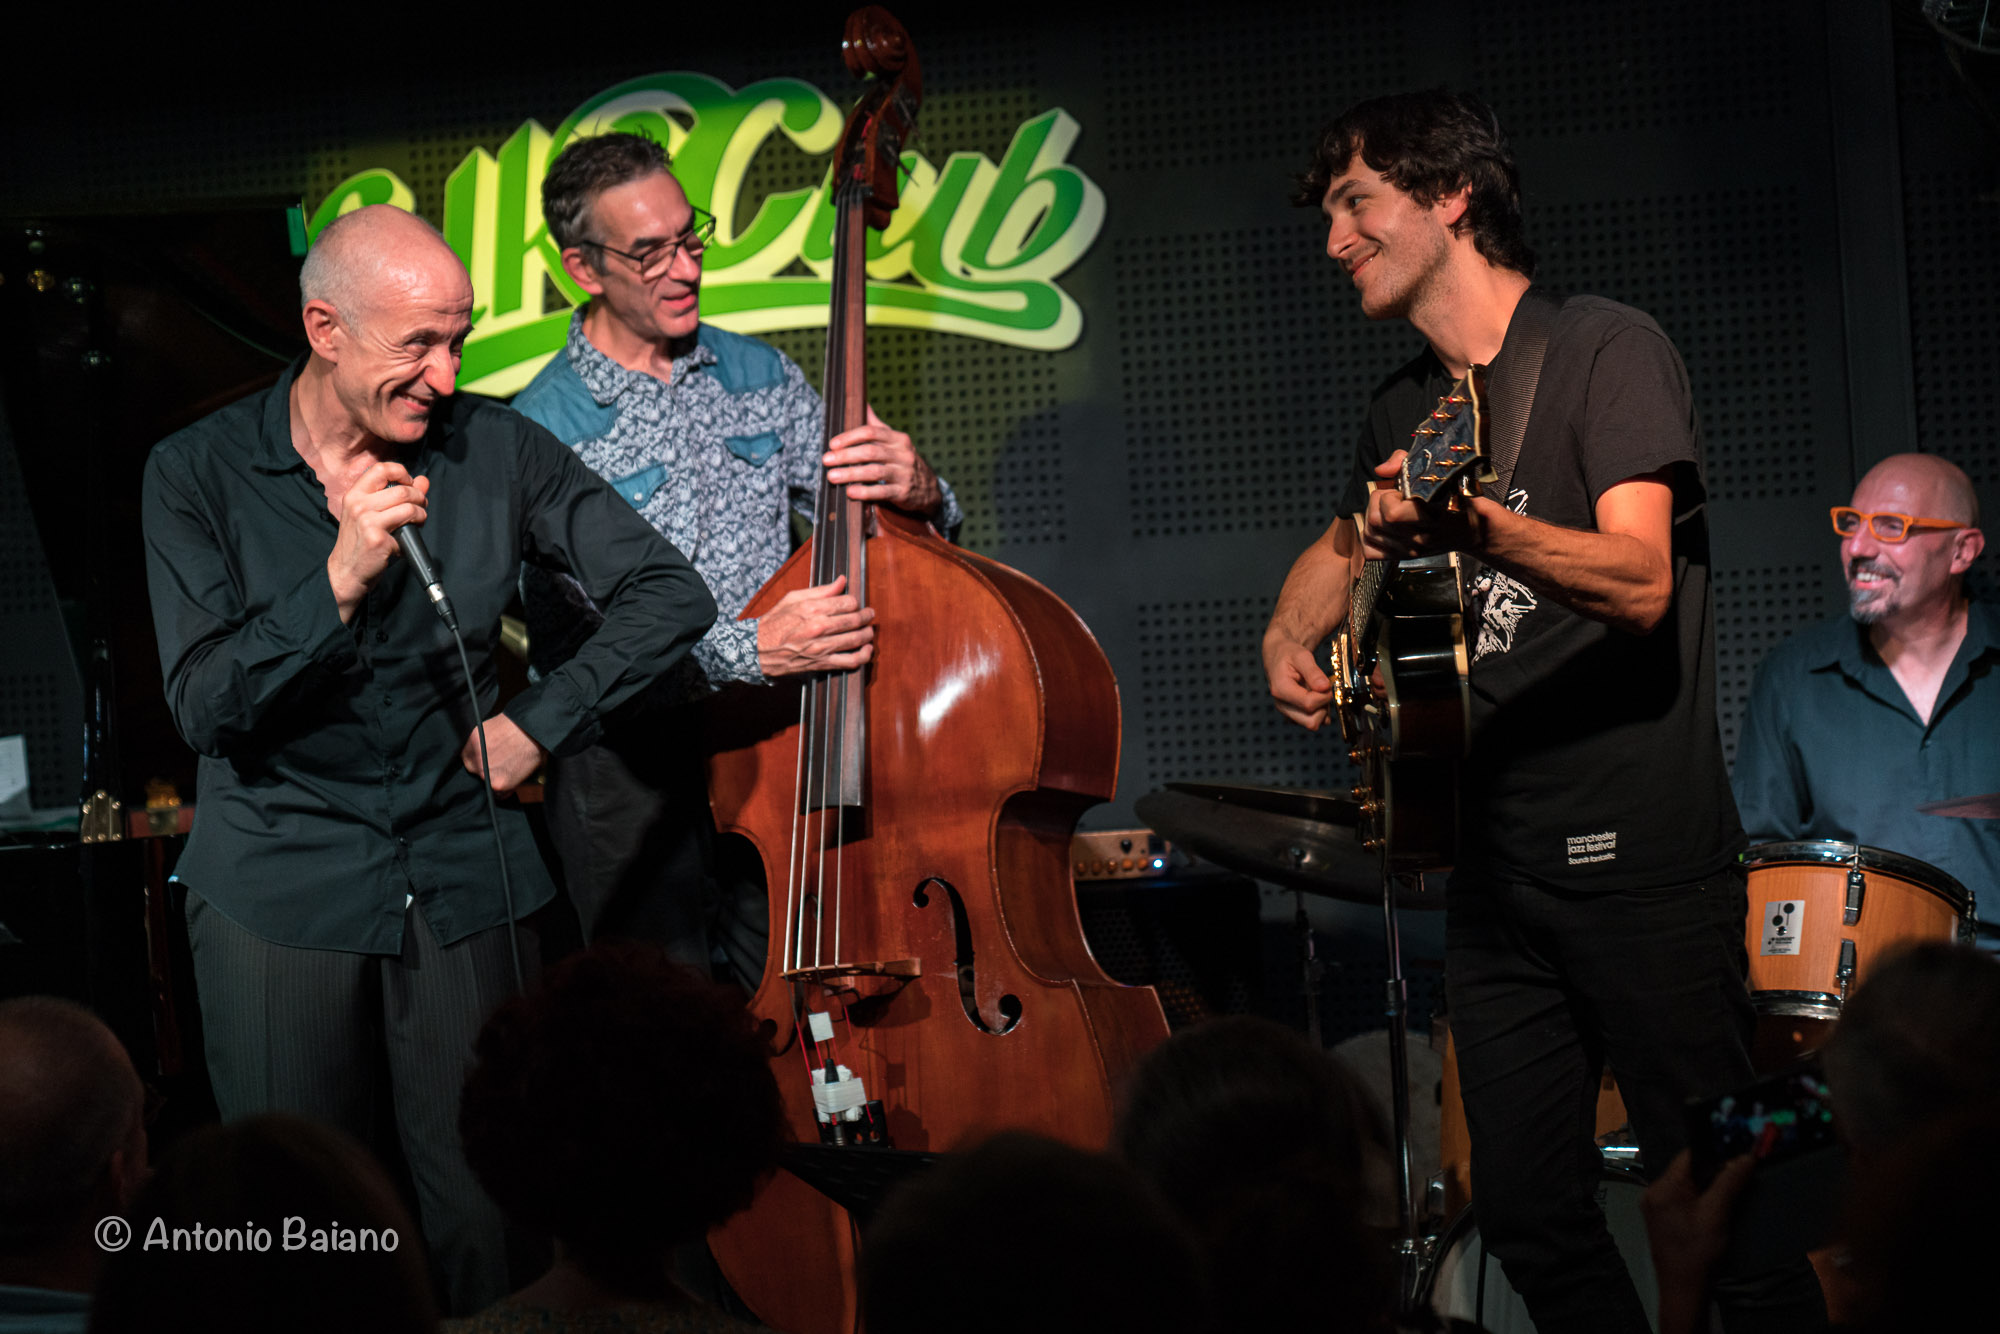 Servillo, Mantovani, Luft and Zirilli